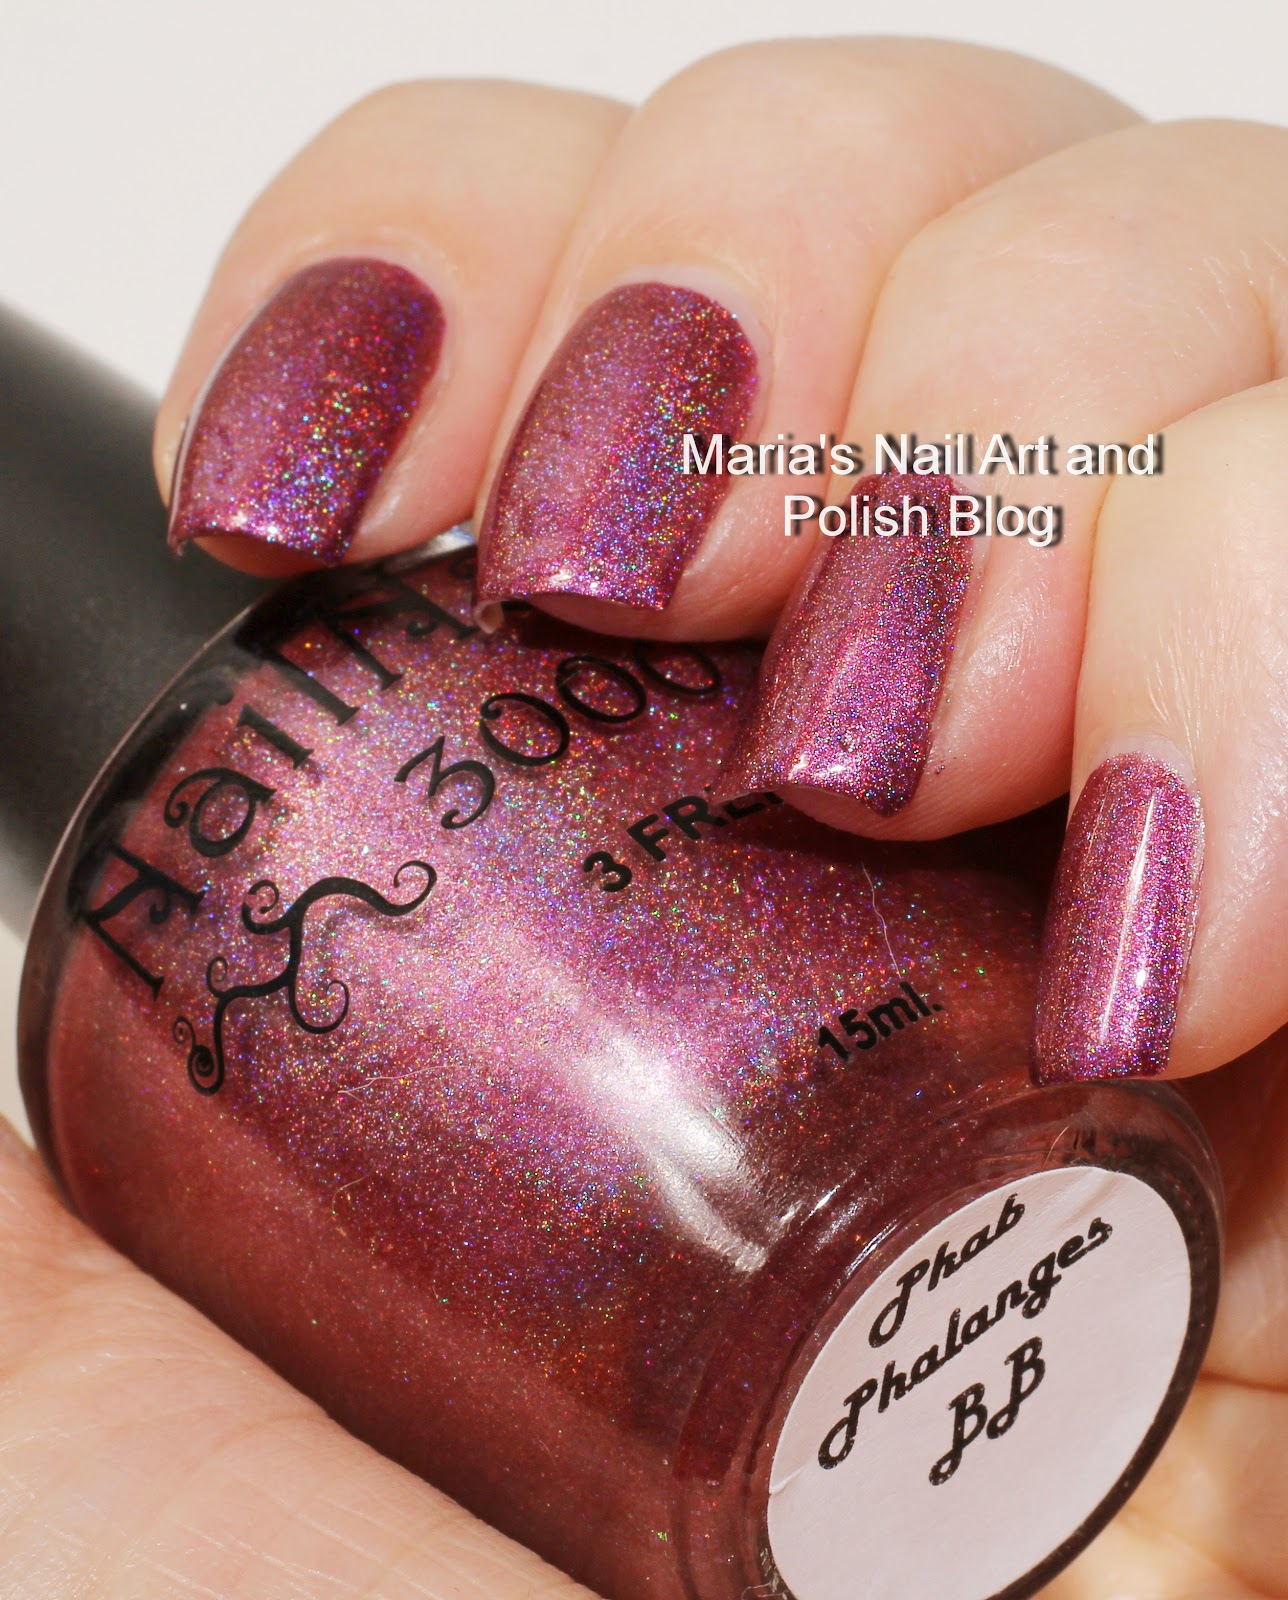 Marias Nail Art And Polish Blog Flushed With Stripes And: Marias Nail Art And Polish Blog: NailNation 3000 Phab